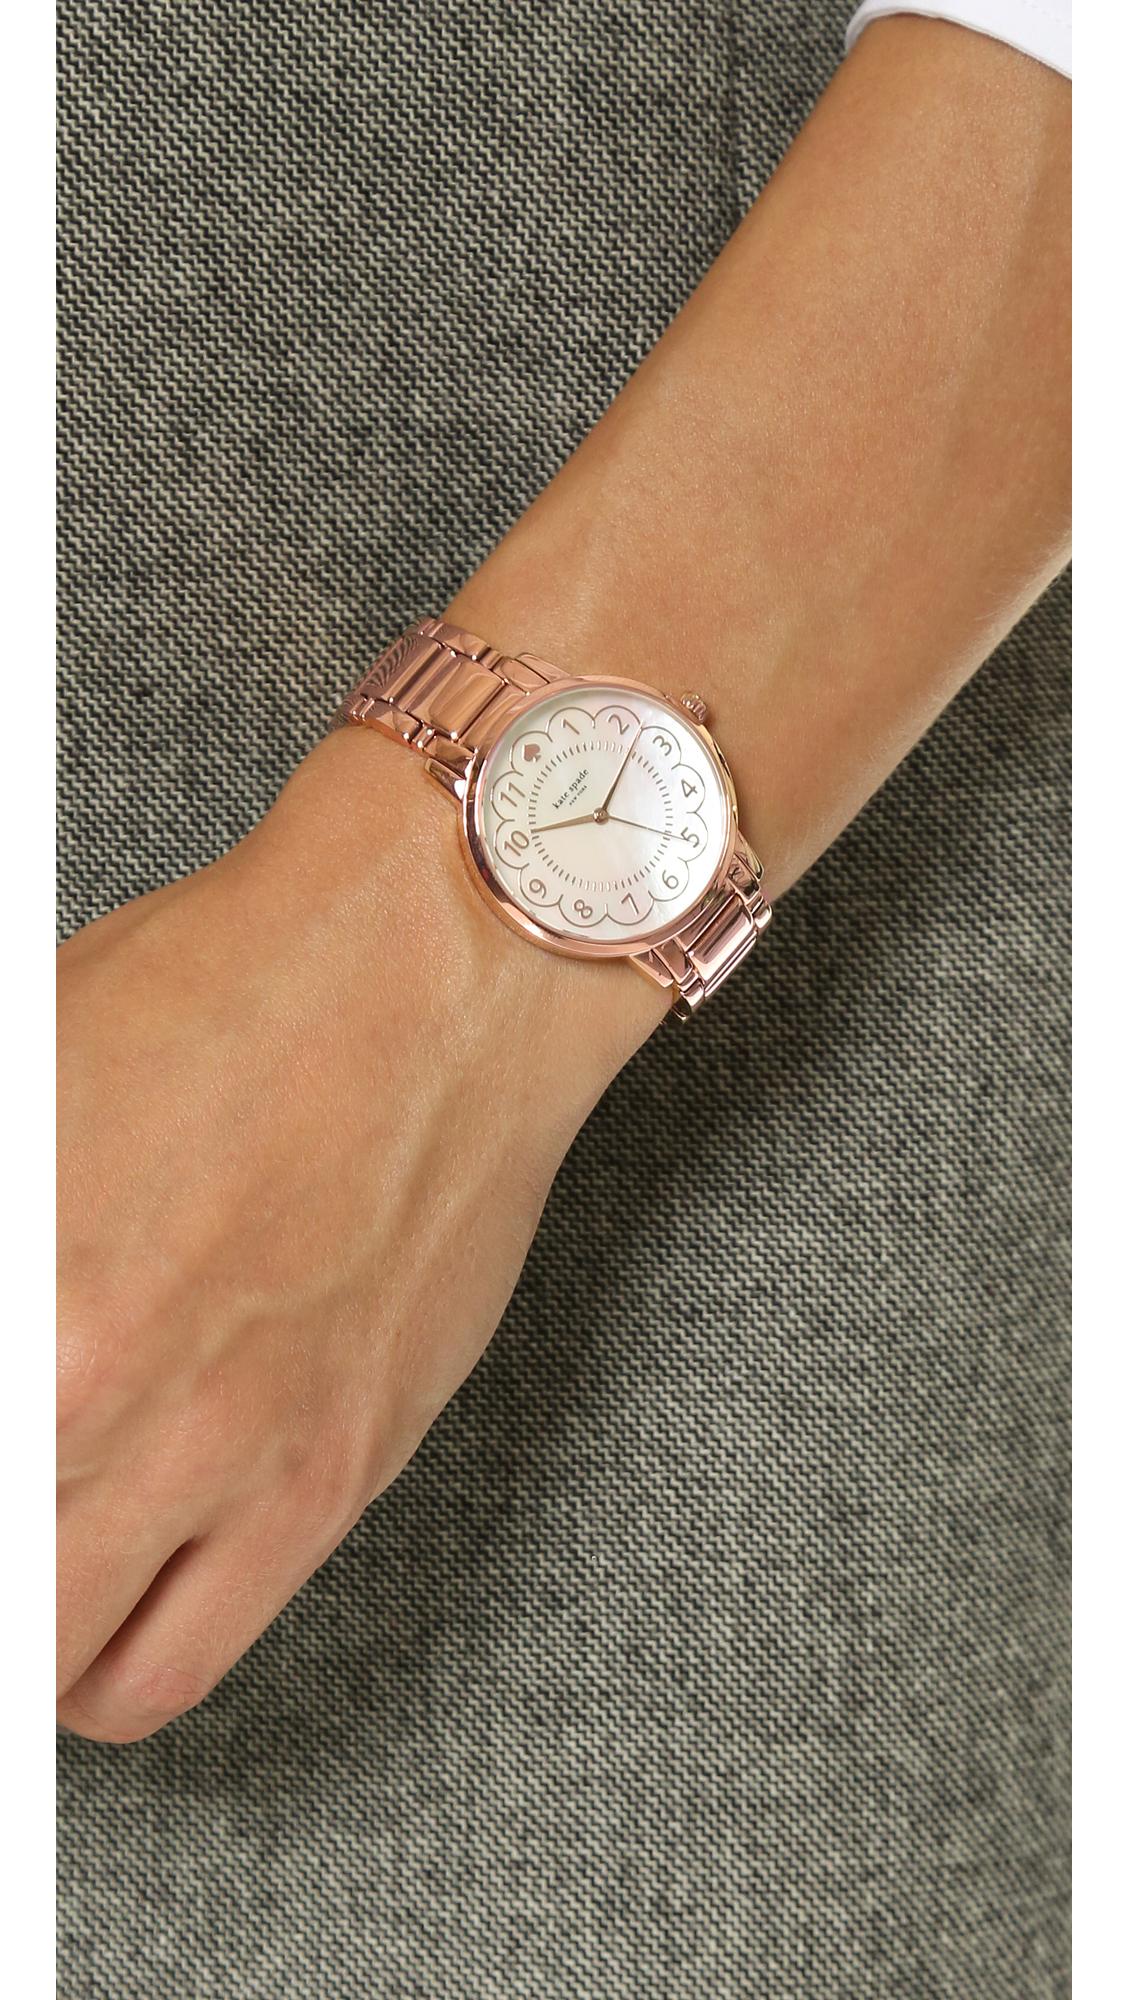 Gramercy Watch Rose Gold